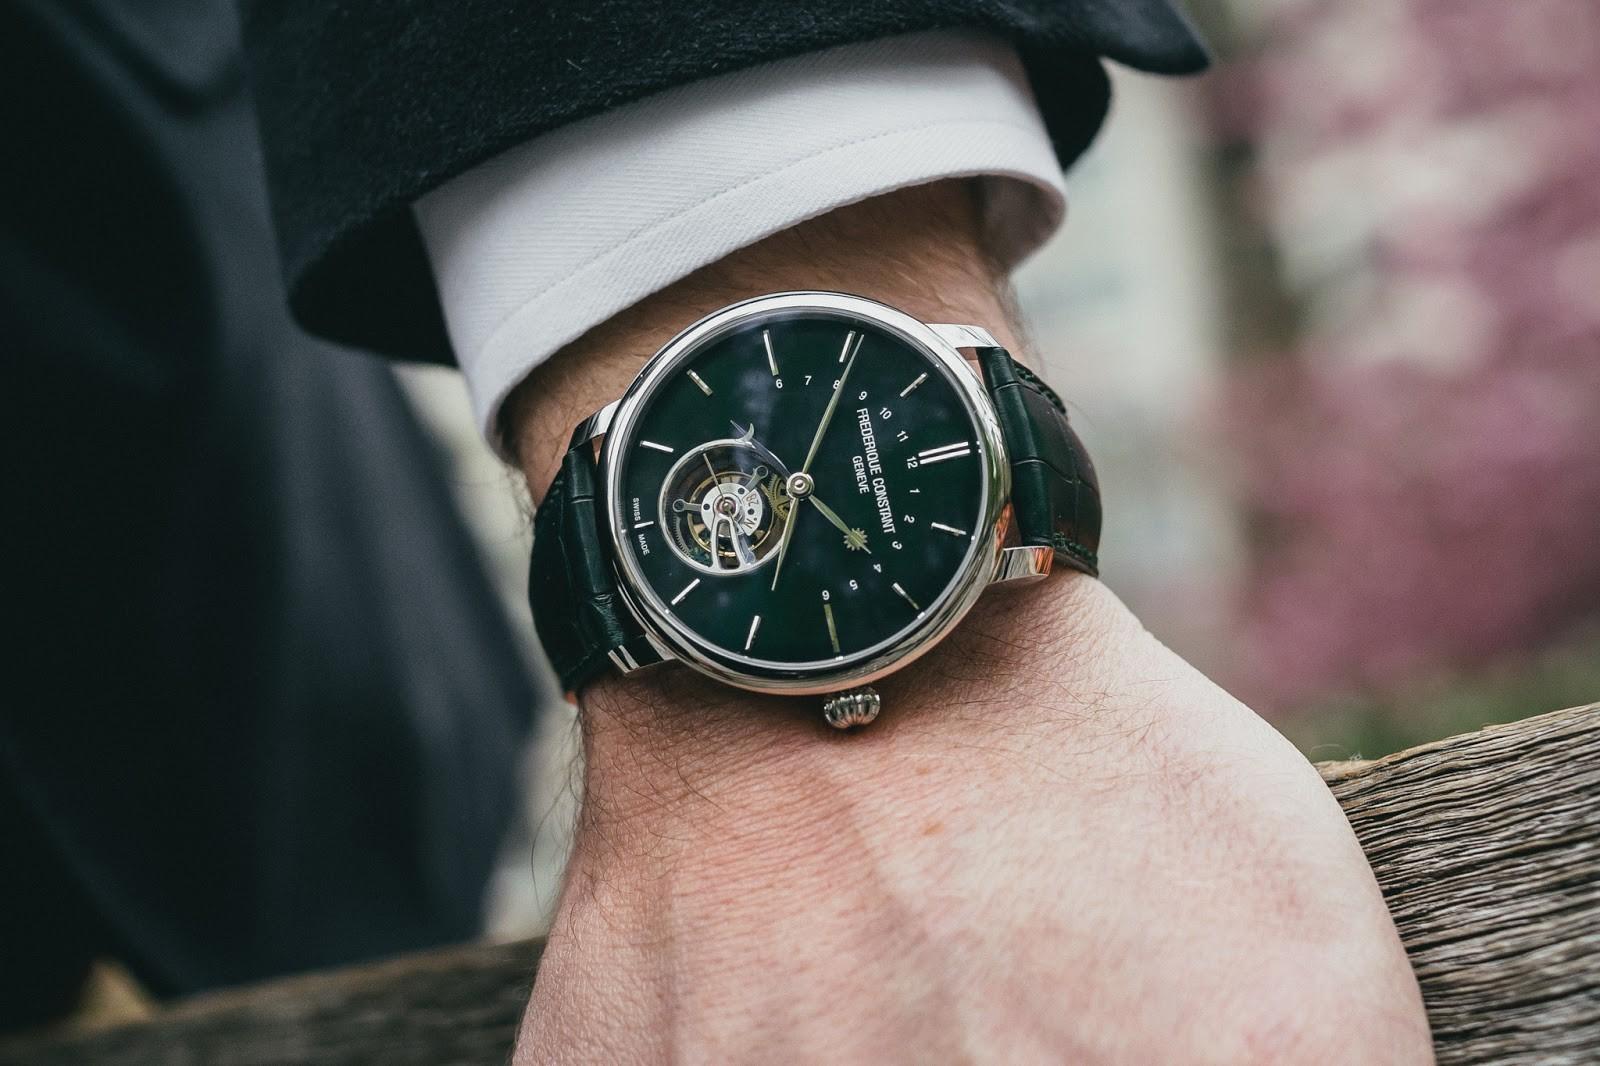 giá đồng hồ Frederique Constant chính hãng